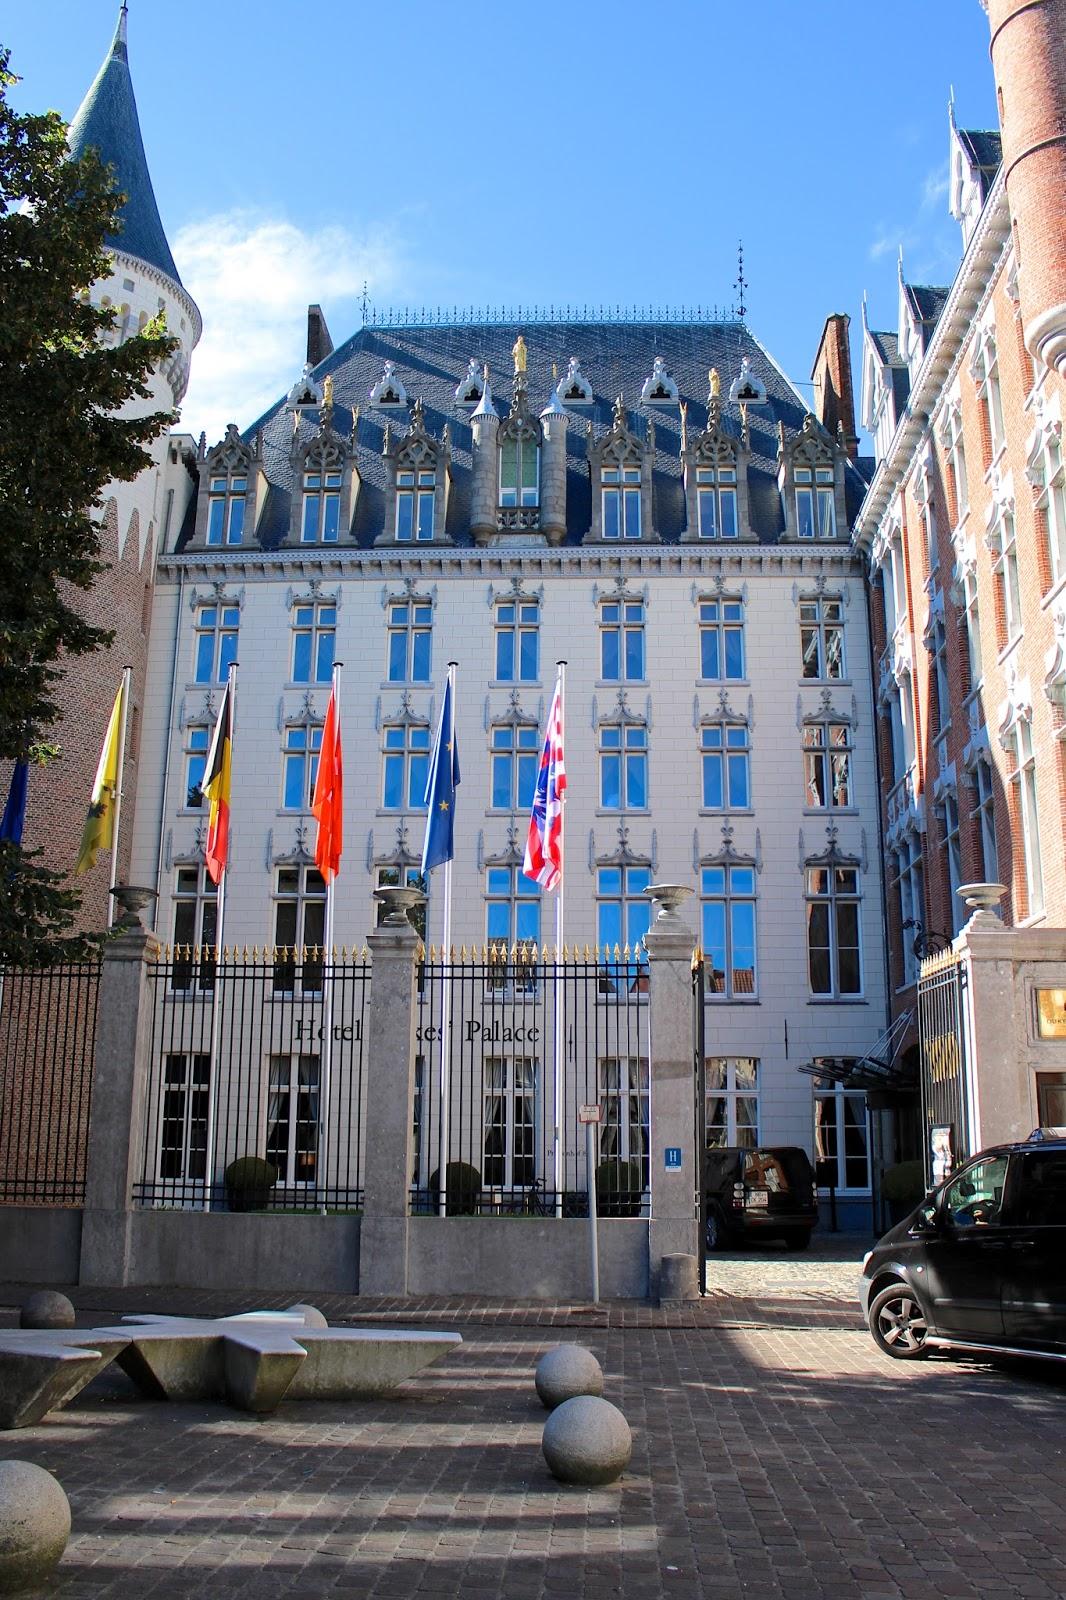 Travel blogger photography of Hotel Dukes' Palace